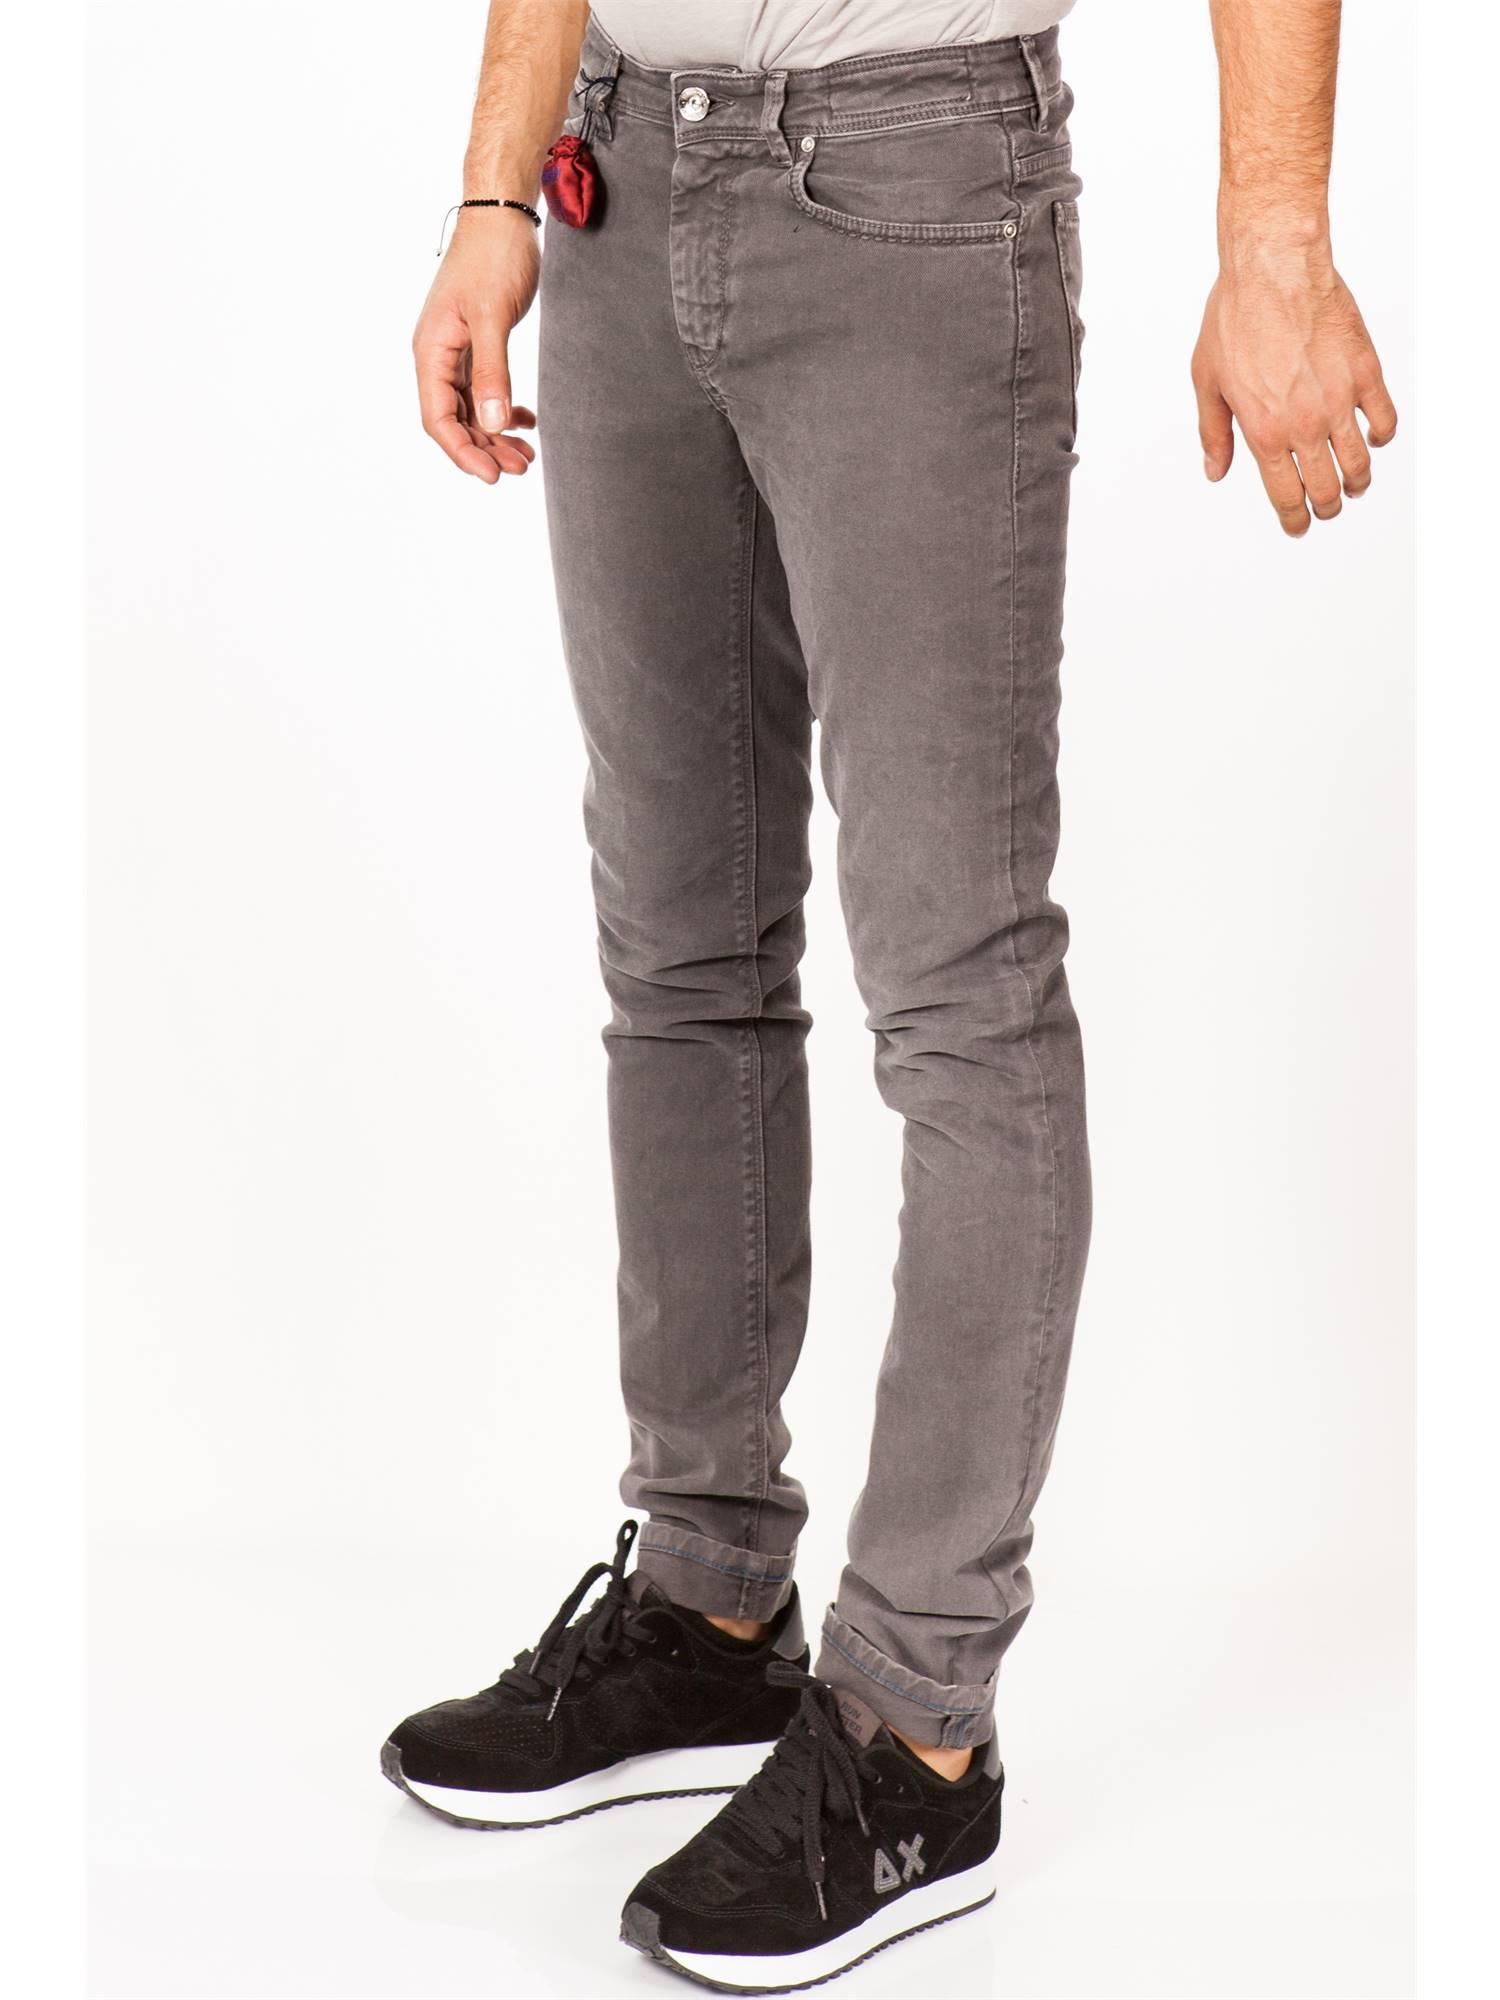 Re-hash Uomo P015 088 5403 GRI GRI GRI Grigio Jeans Uomo Autunno Inverno eadf9c